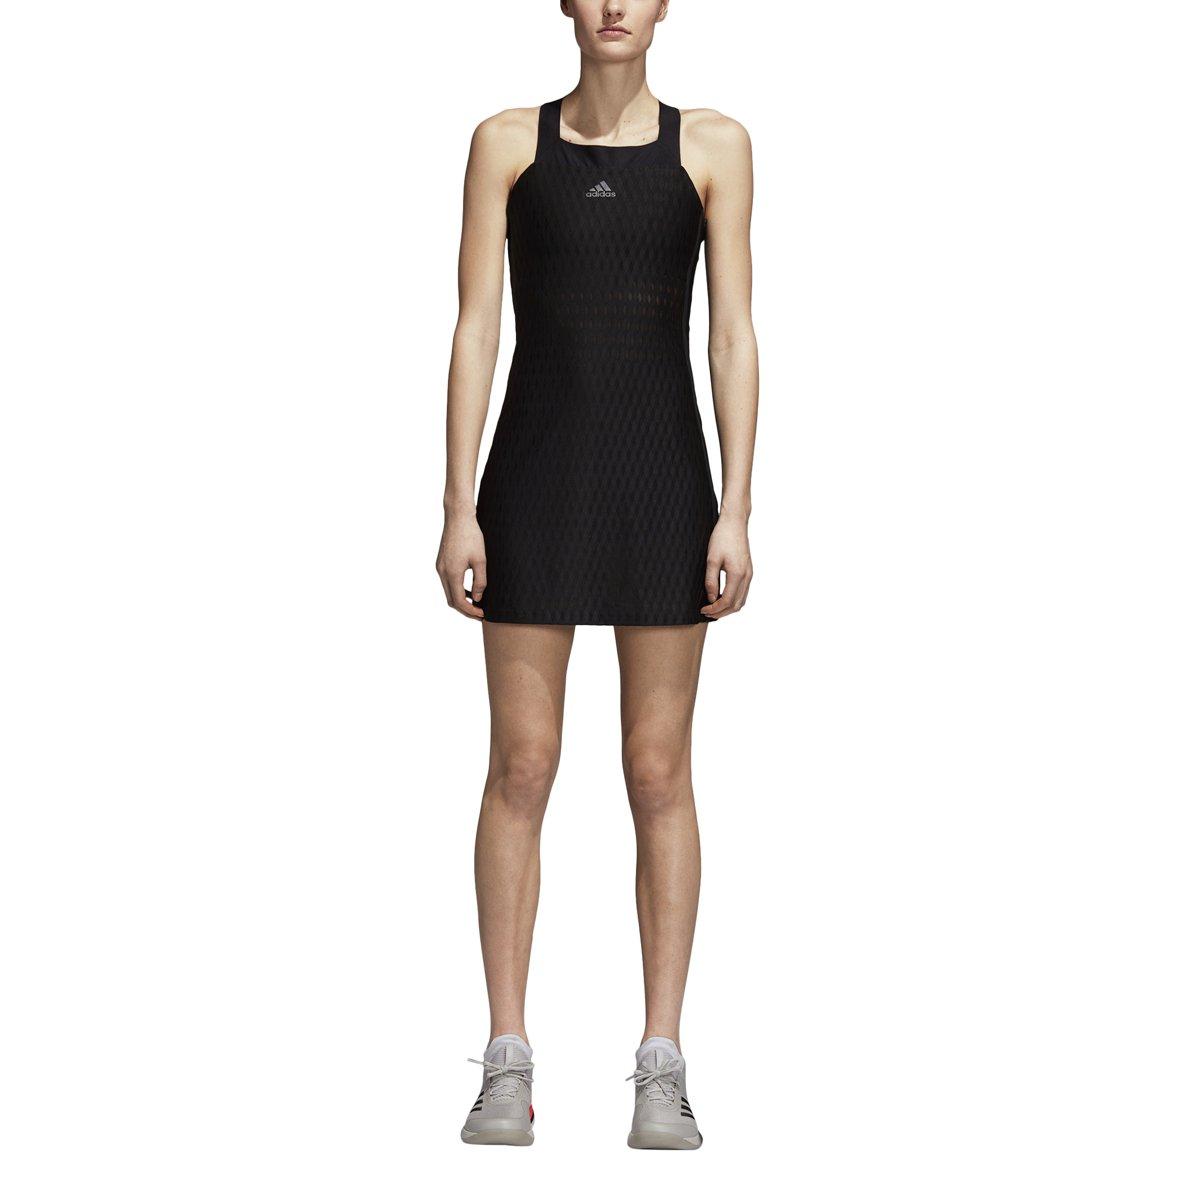 adidas Women's Tennis Barricade Dress, Black, X-Large